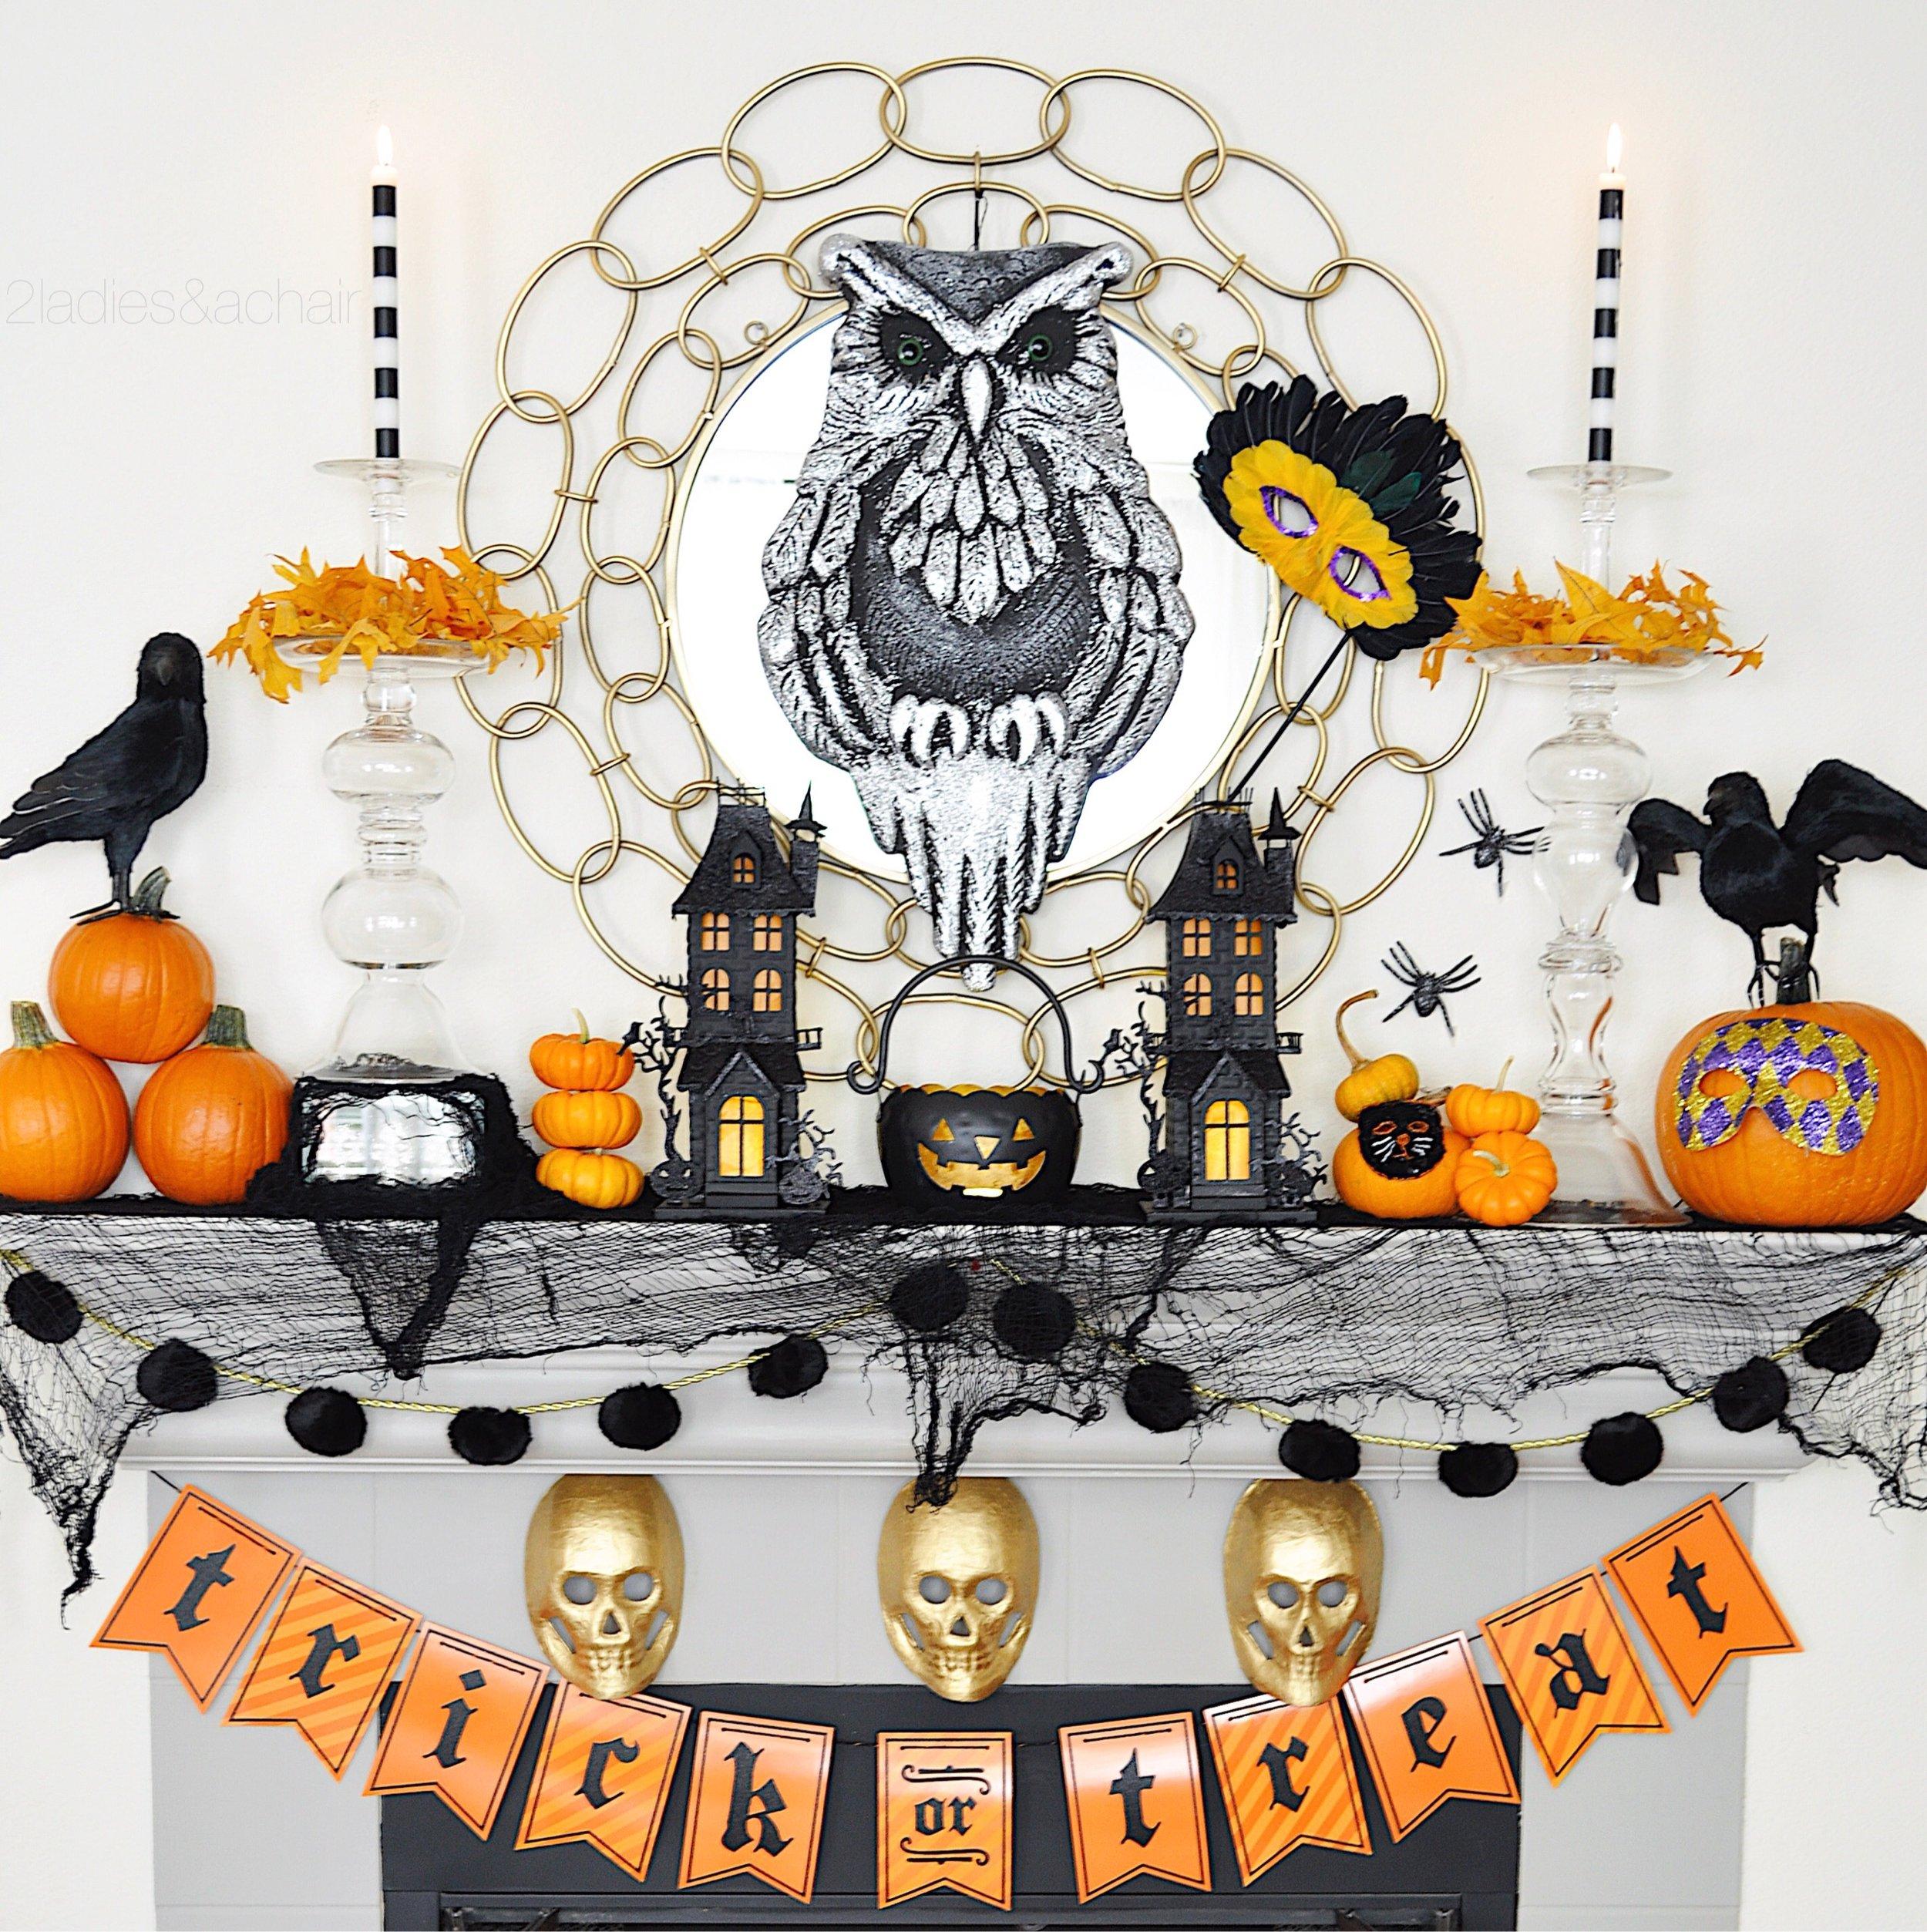 halloween mantel decorations FullSizeRender(82).jpg